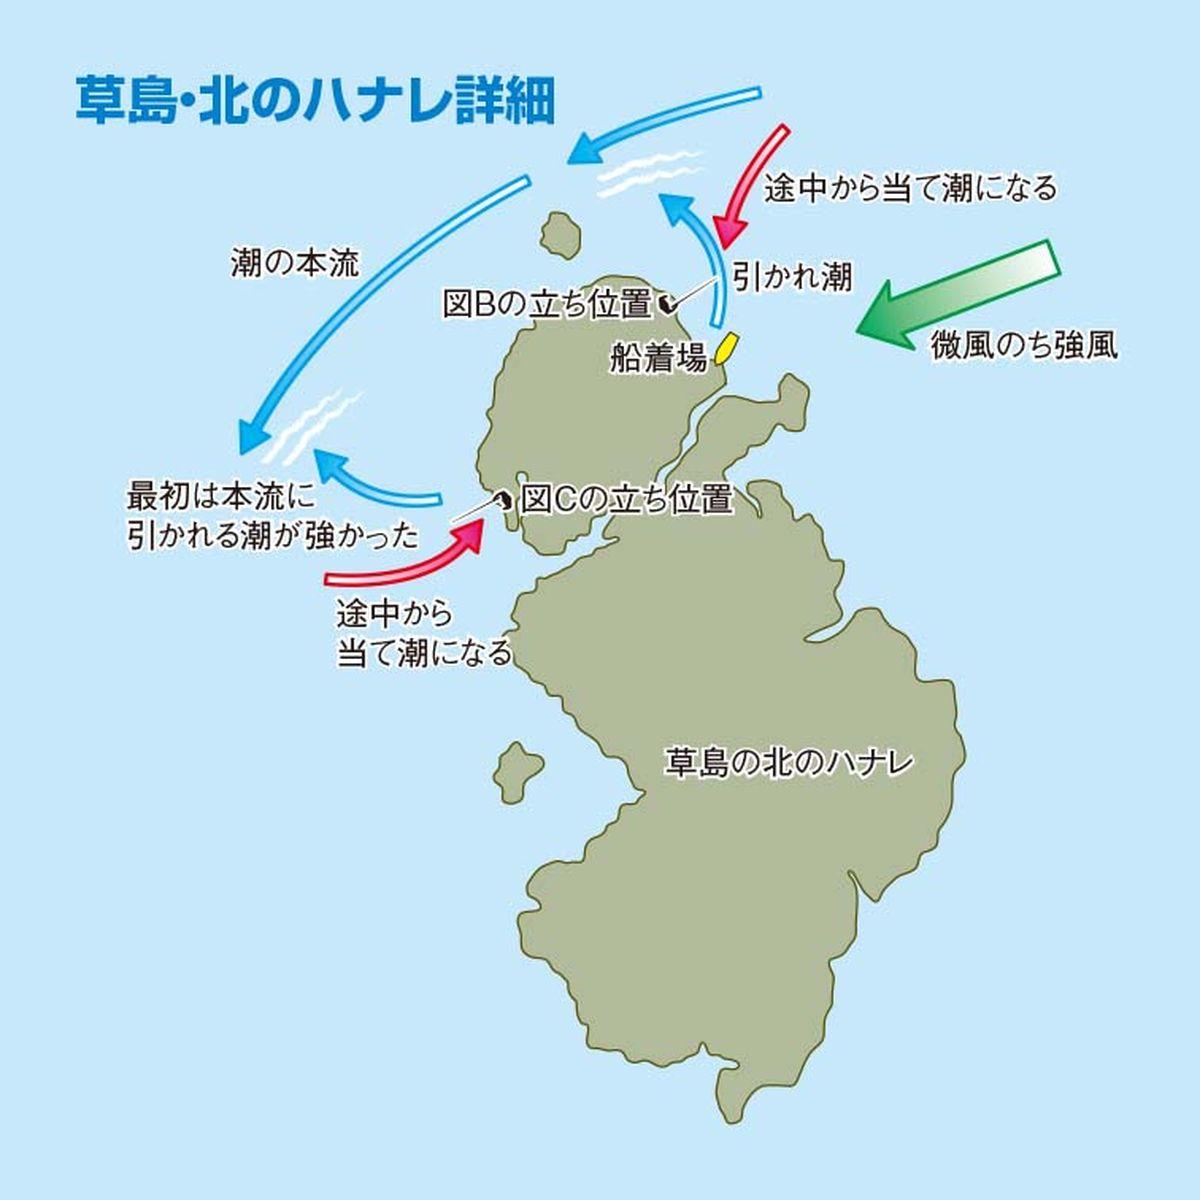 088-091tanaka-highteku_cs6 (21)